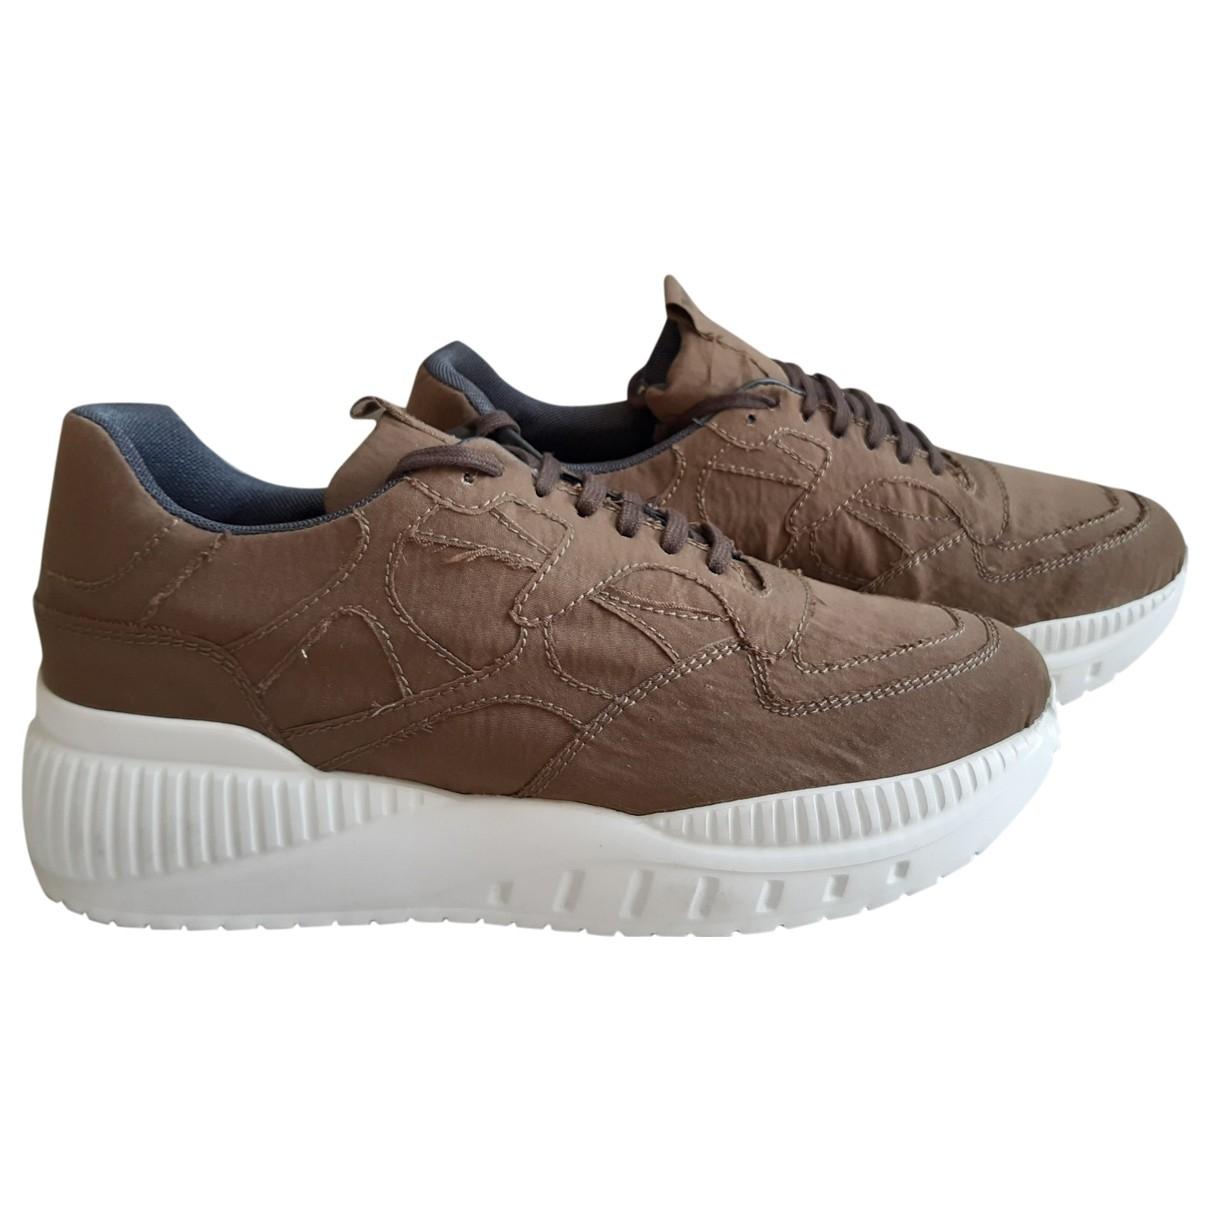 Emporio Armani \N Sneakers in  Braun Leinen